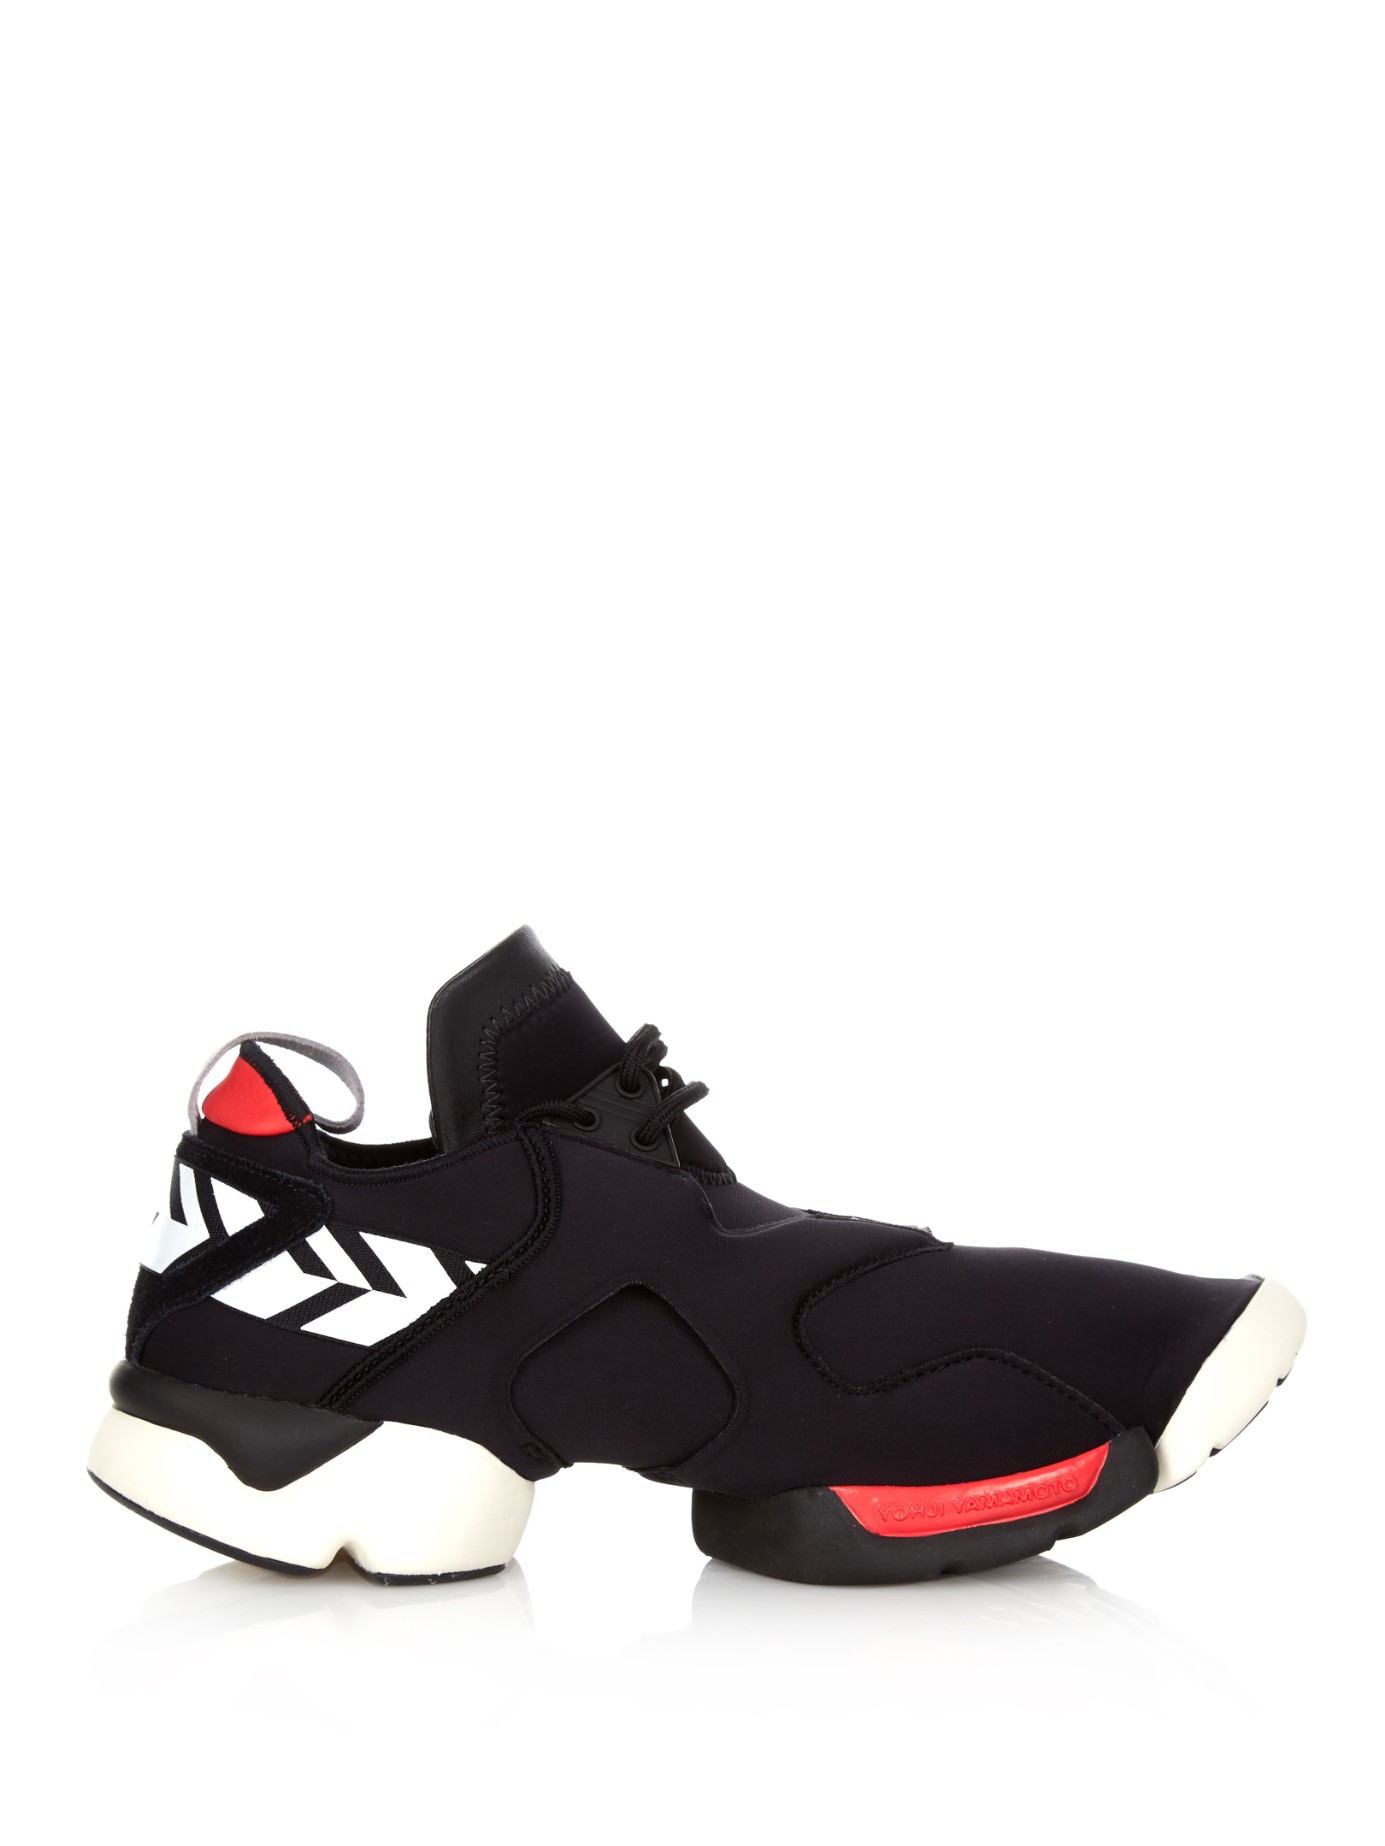 7fe0991bc45417 Lyst - Y-3 Kohna Low-Top Sneakers in Black for Men